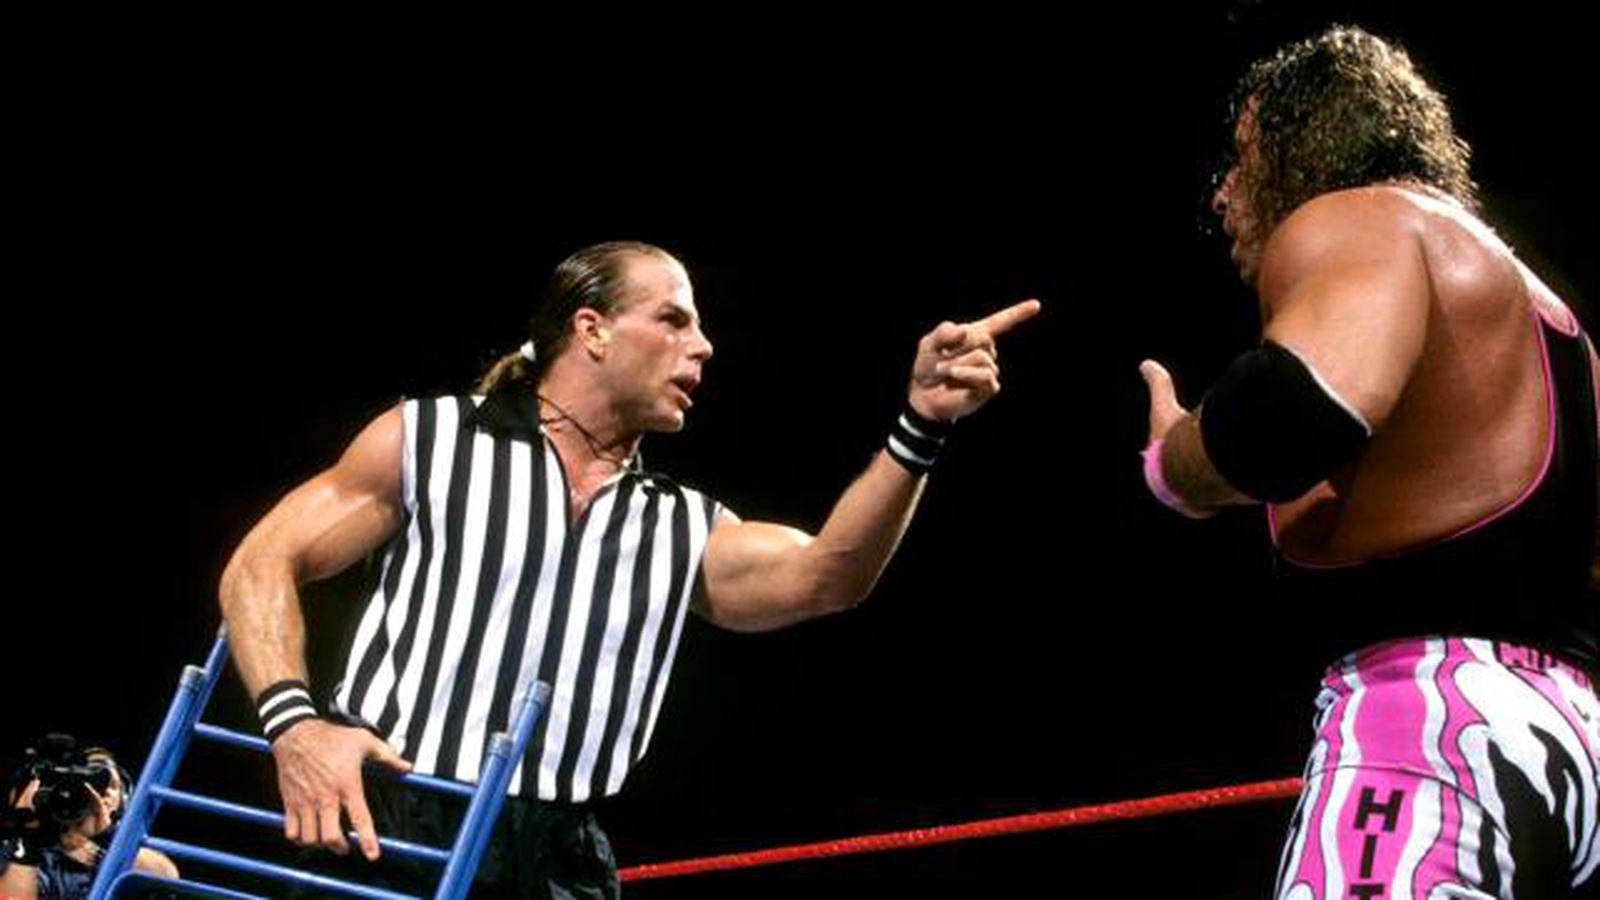 Ranking Summerslam 4 1997 Bret Hart Vs The Undertaker